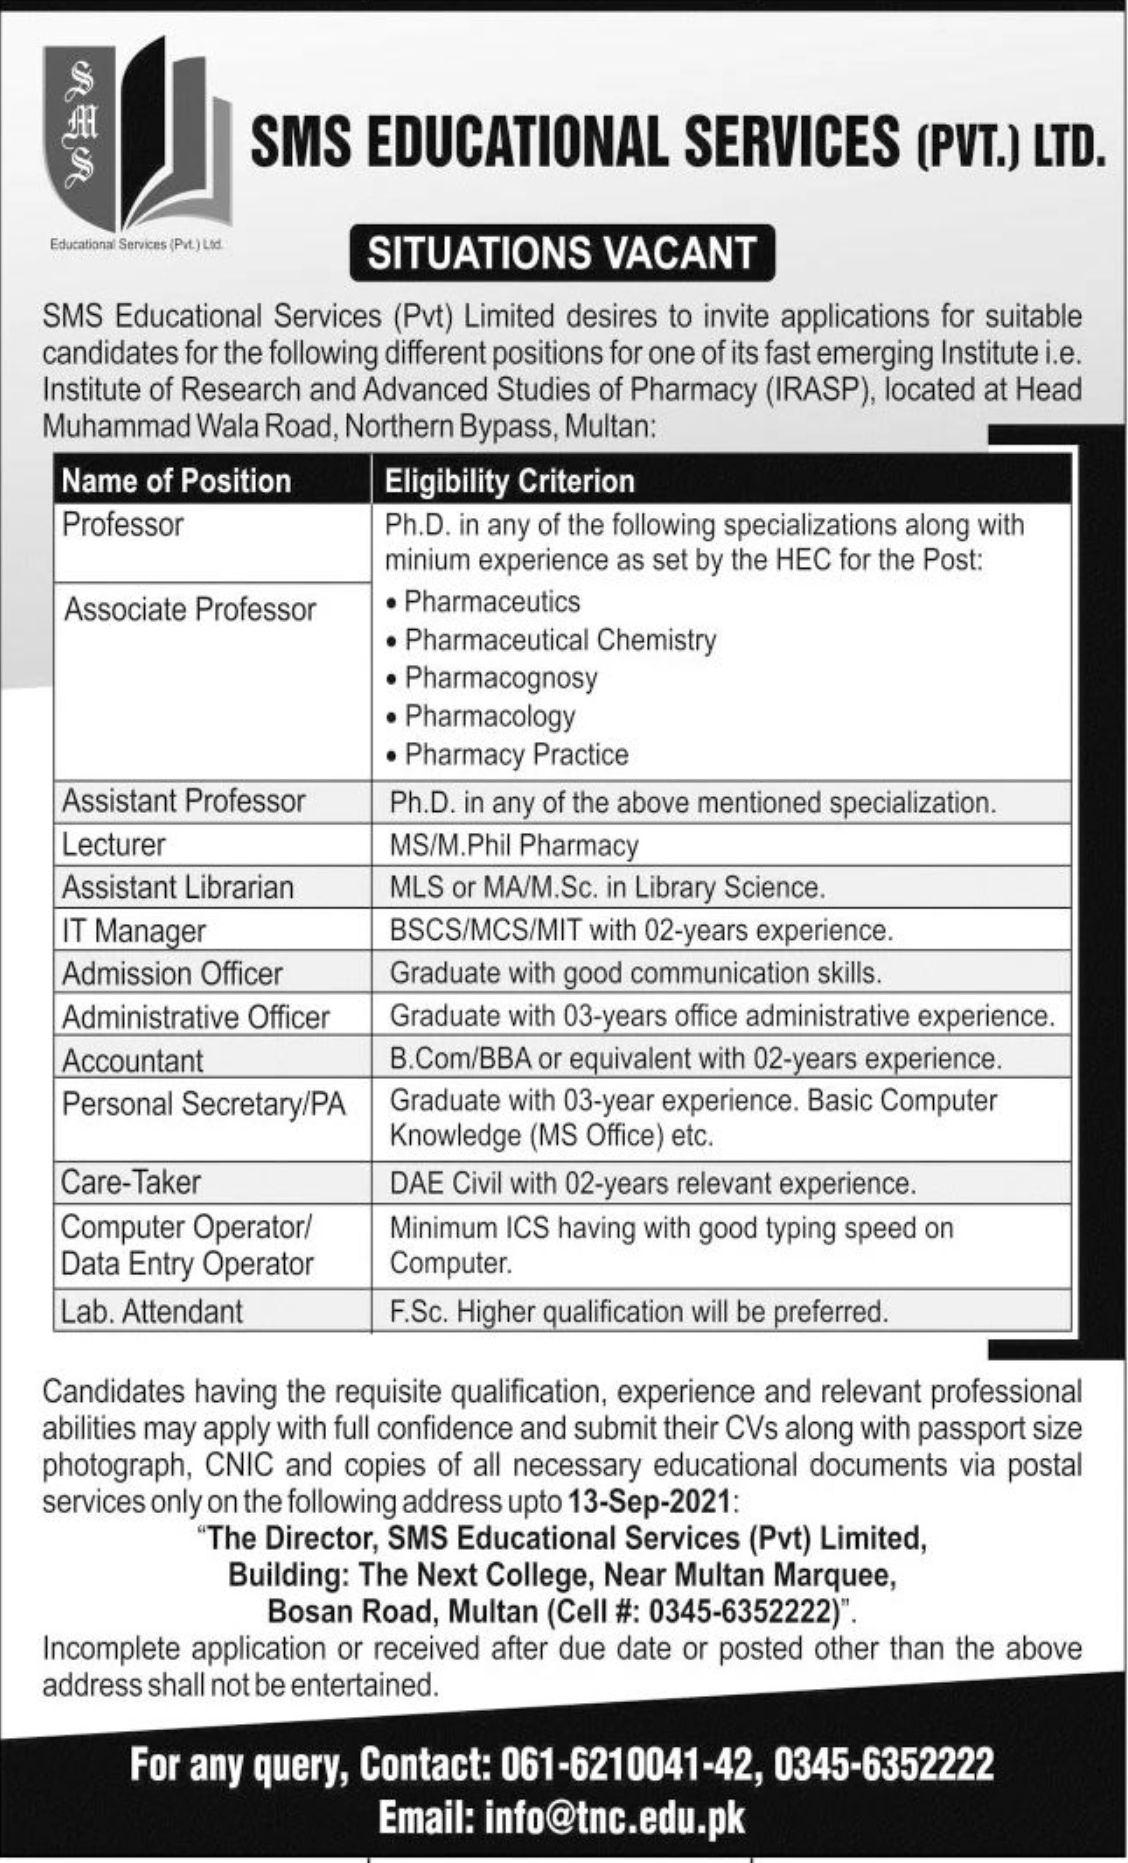 SMS Educational Services Pvt Ltd Vacancies 2021 3